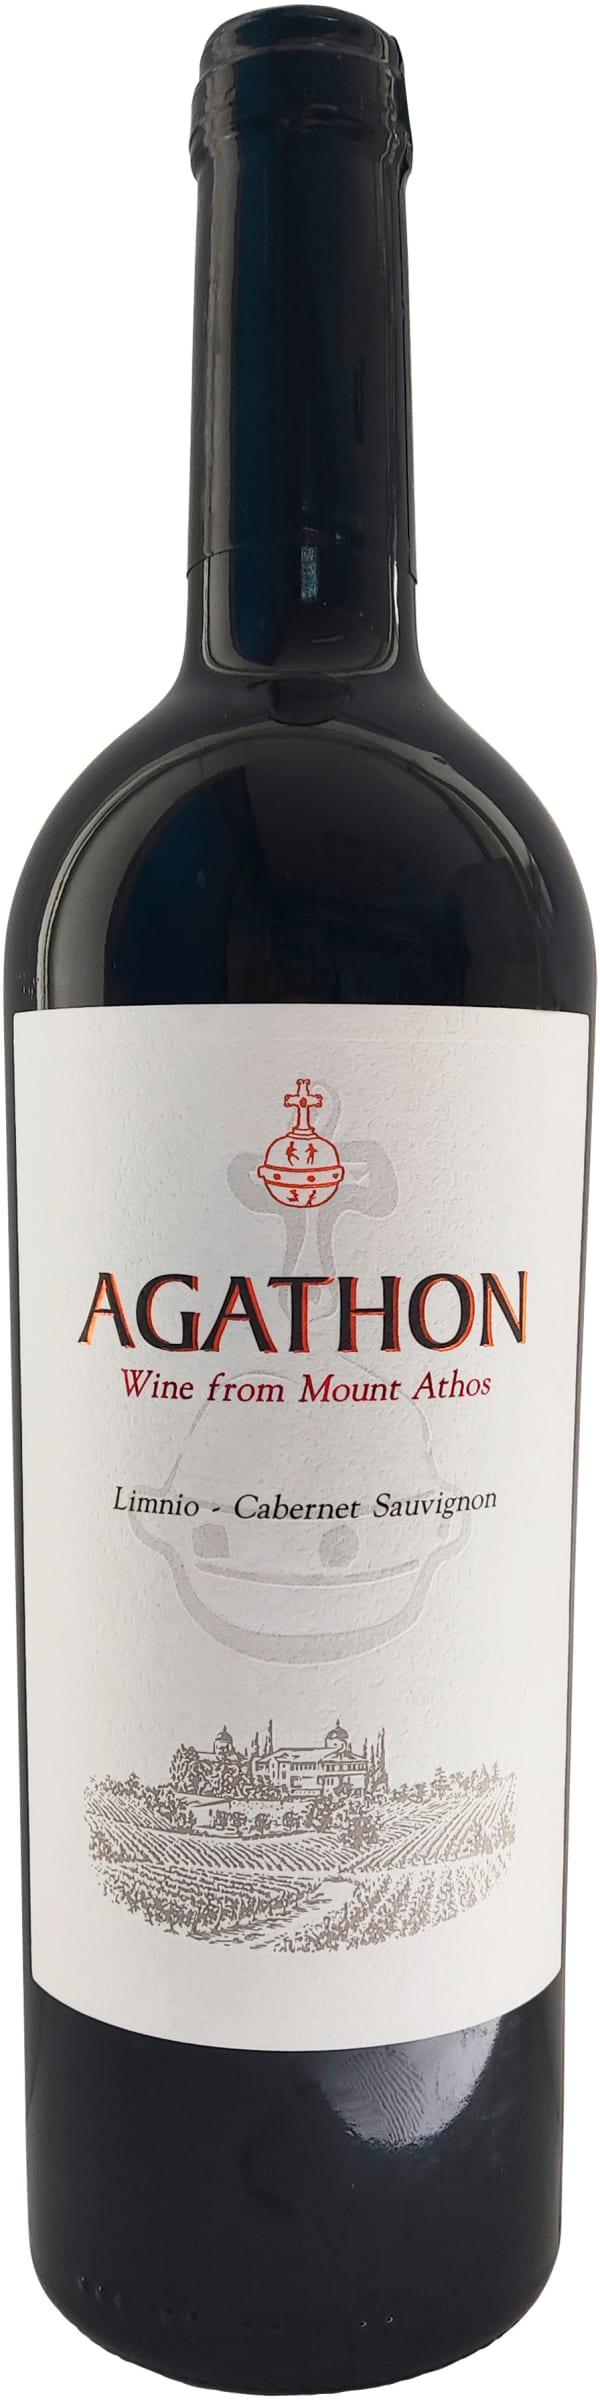 Agathon Limnio Cabernet Sauvignon 2017